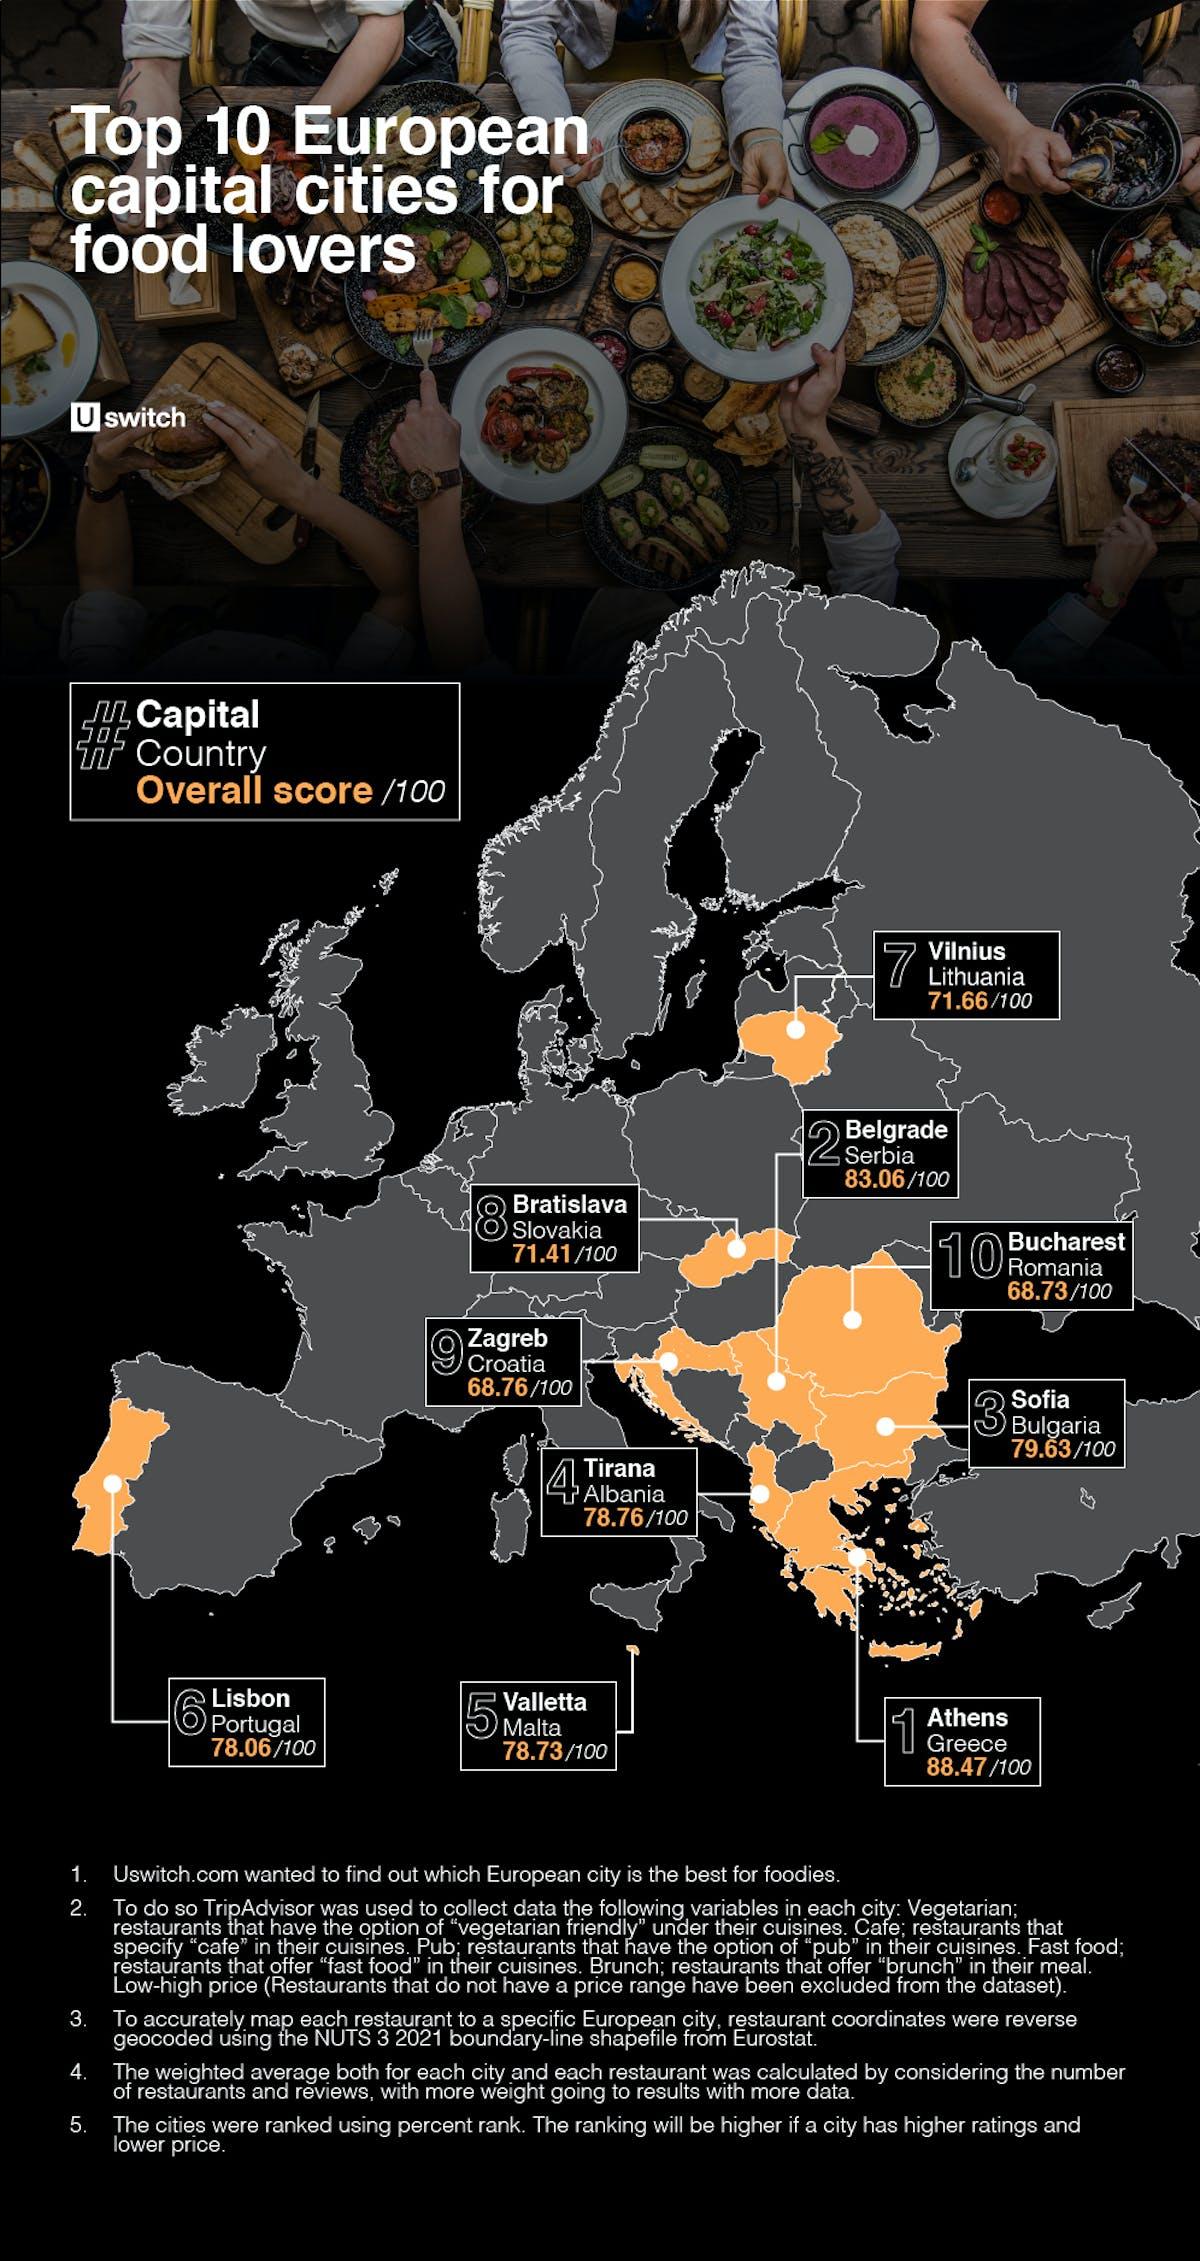 Top ten European capital cities for food lovers map